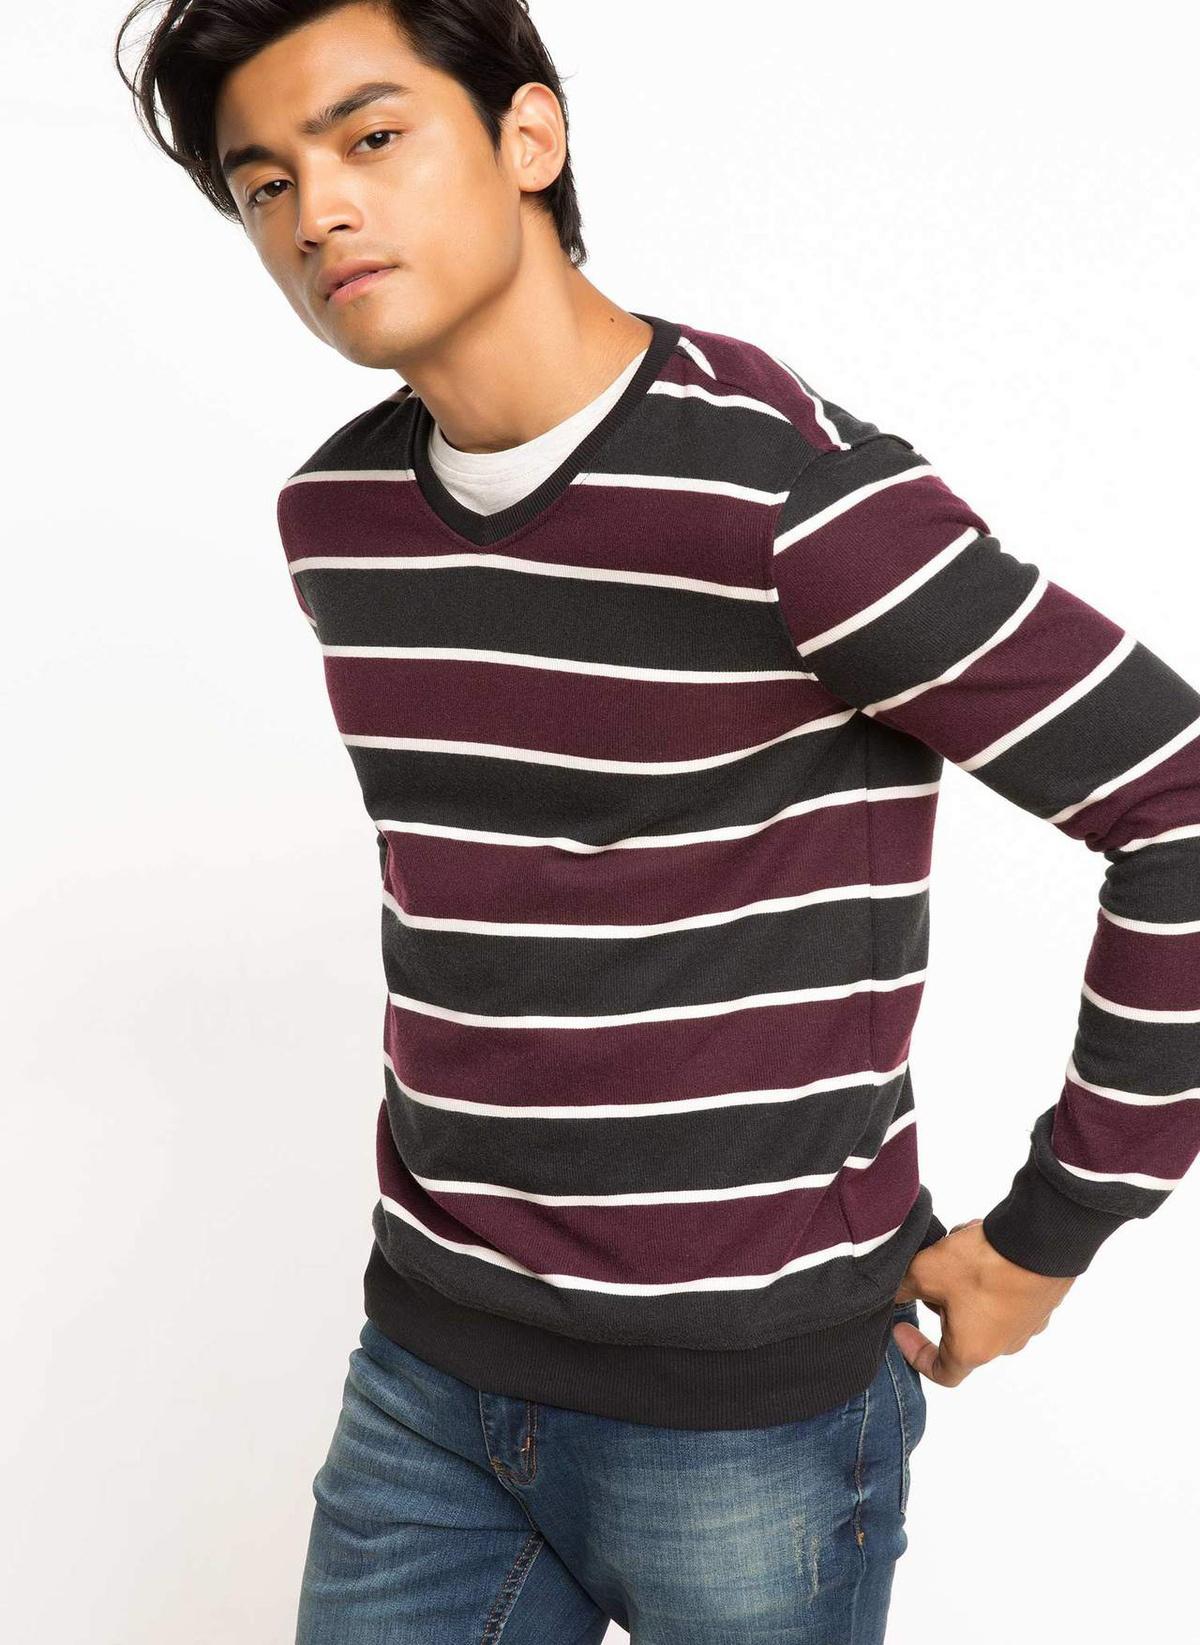 Defacto V Yaka Çizgili Sweatshirt H6993az17wnbk27 Sweatshirt – 69.99 TL